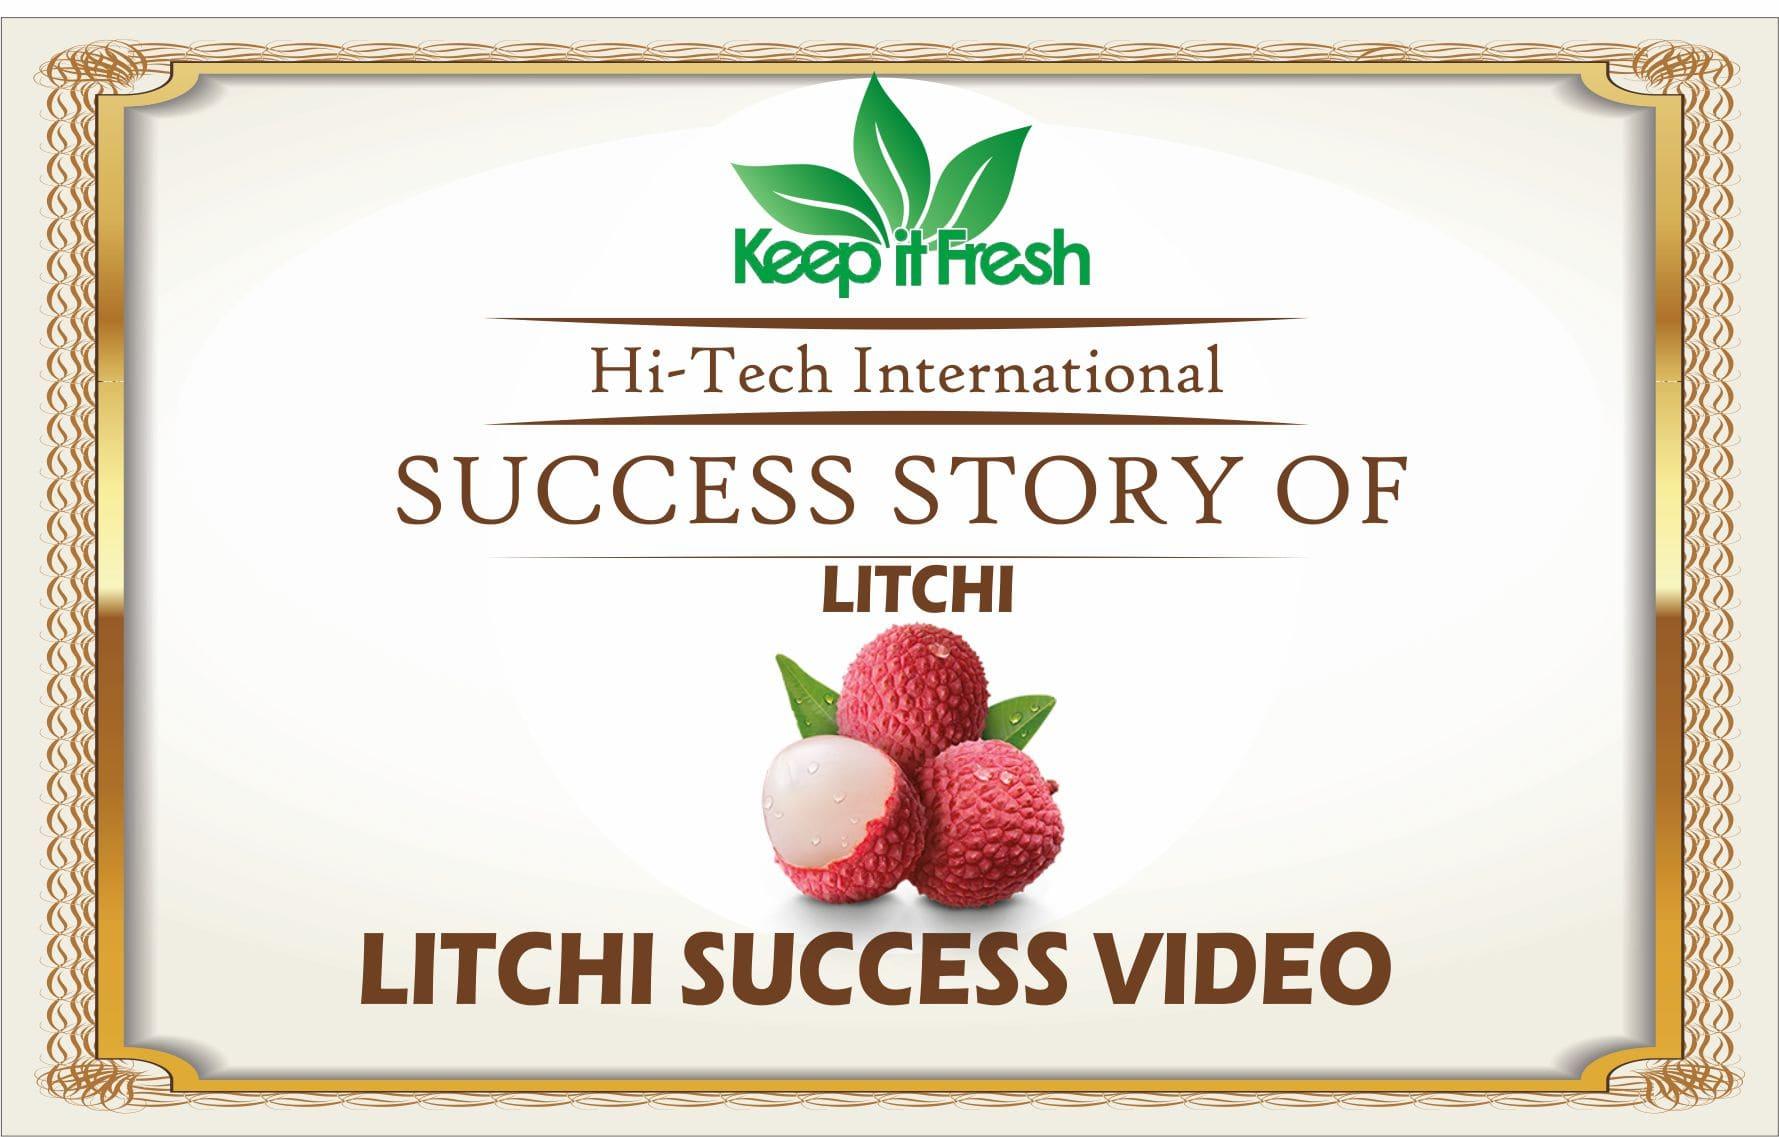 LITCHI STORY